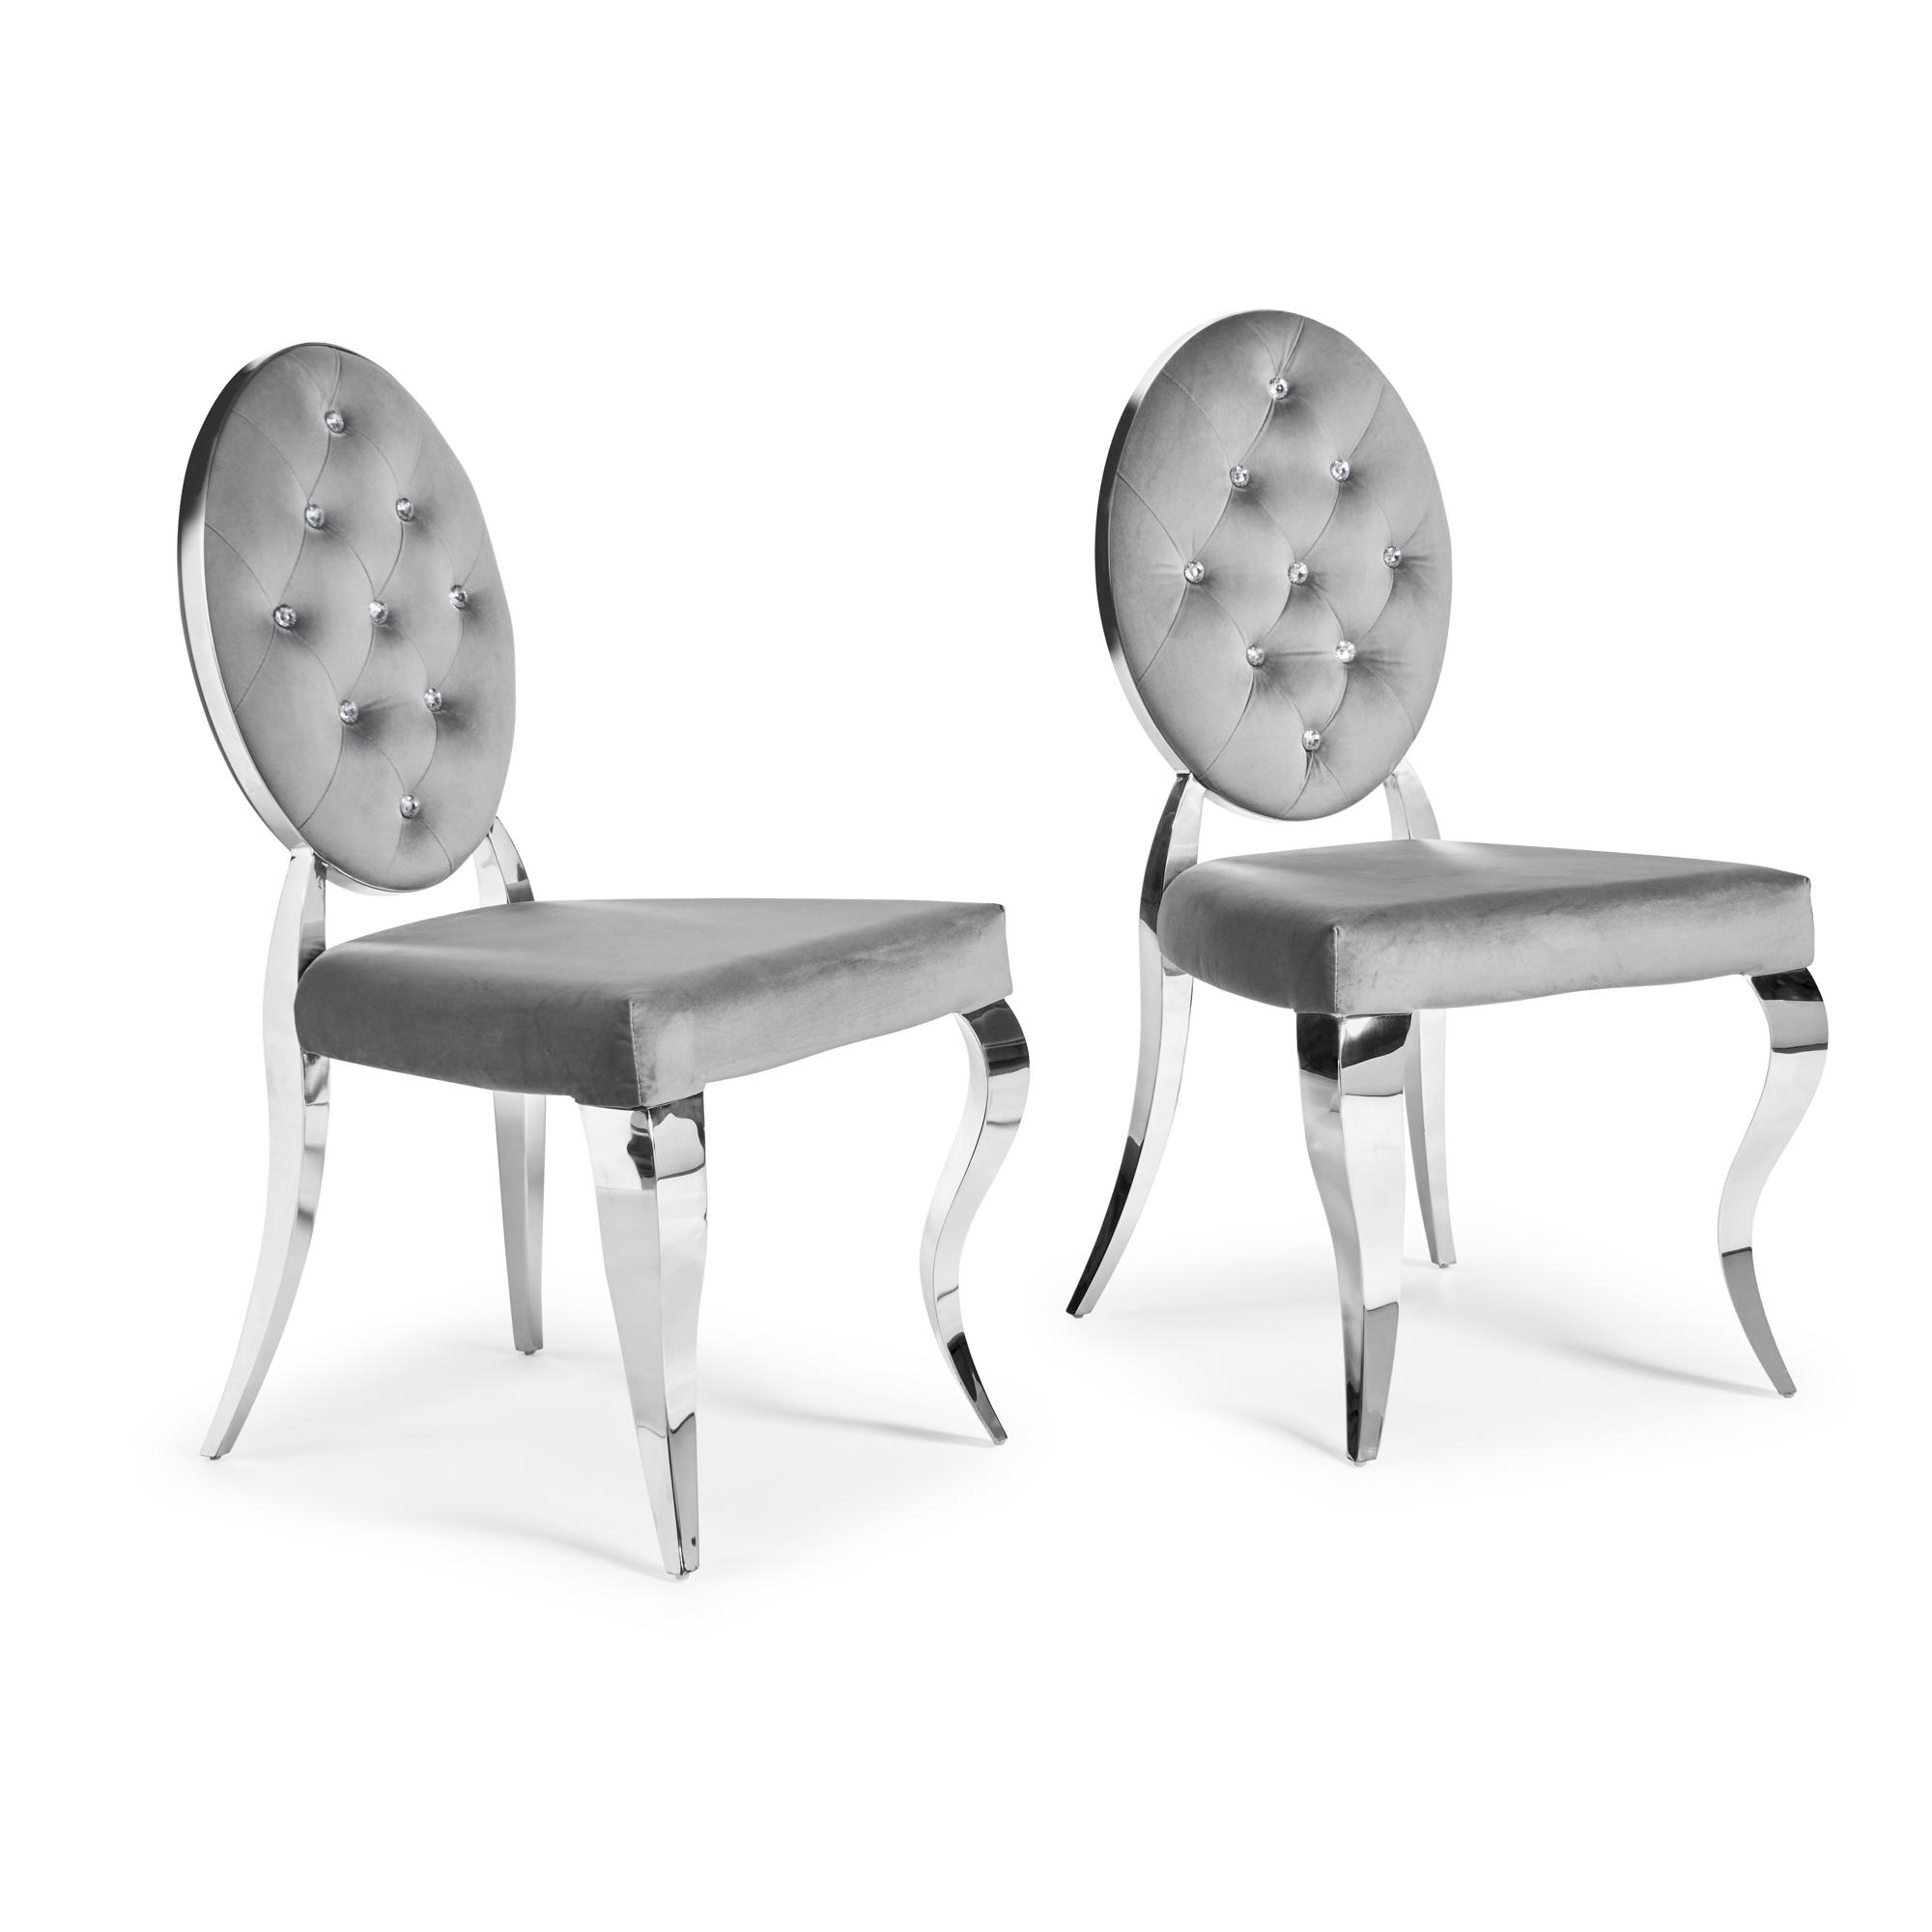 Louis Grey Velvet Dining Chairs with Chrome Legs & Diamond Studded Backrest (Set of 2)